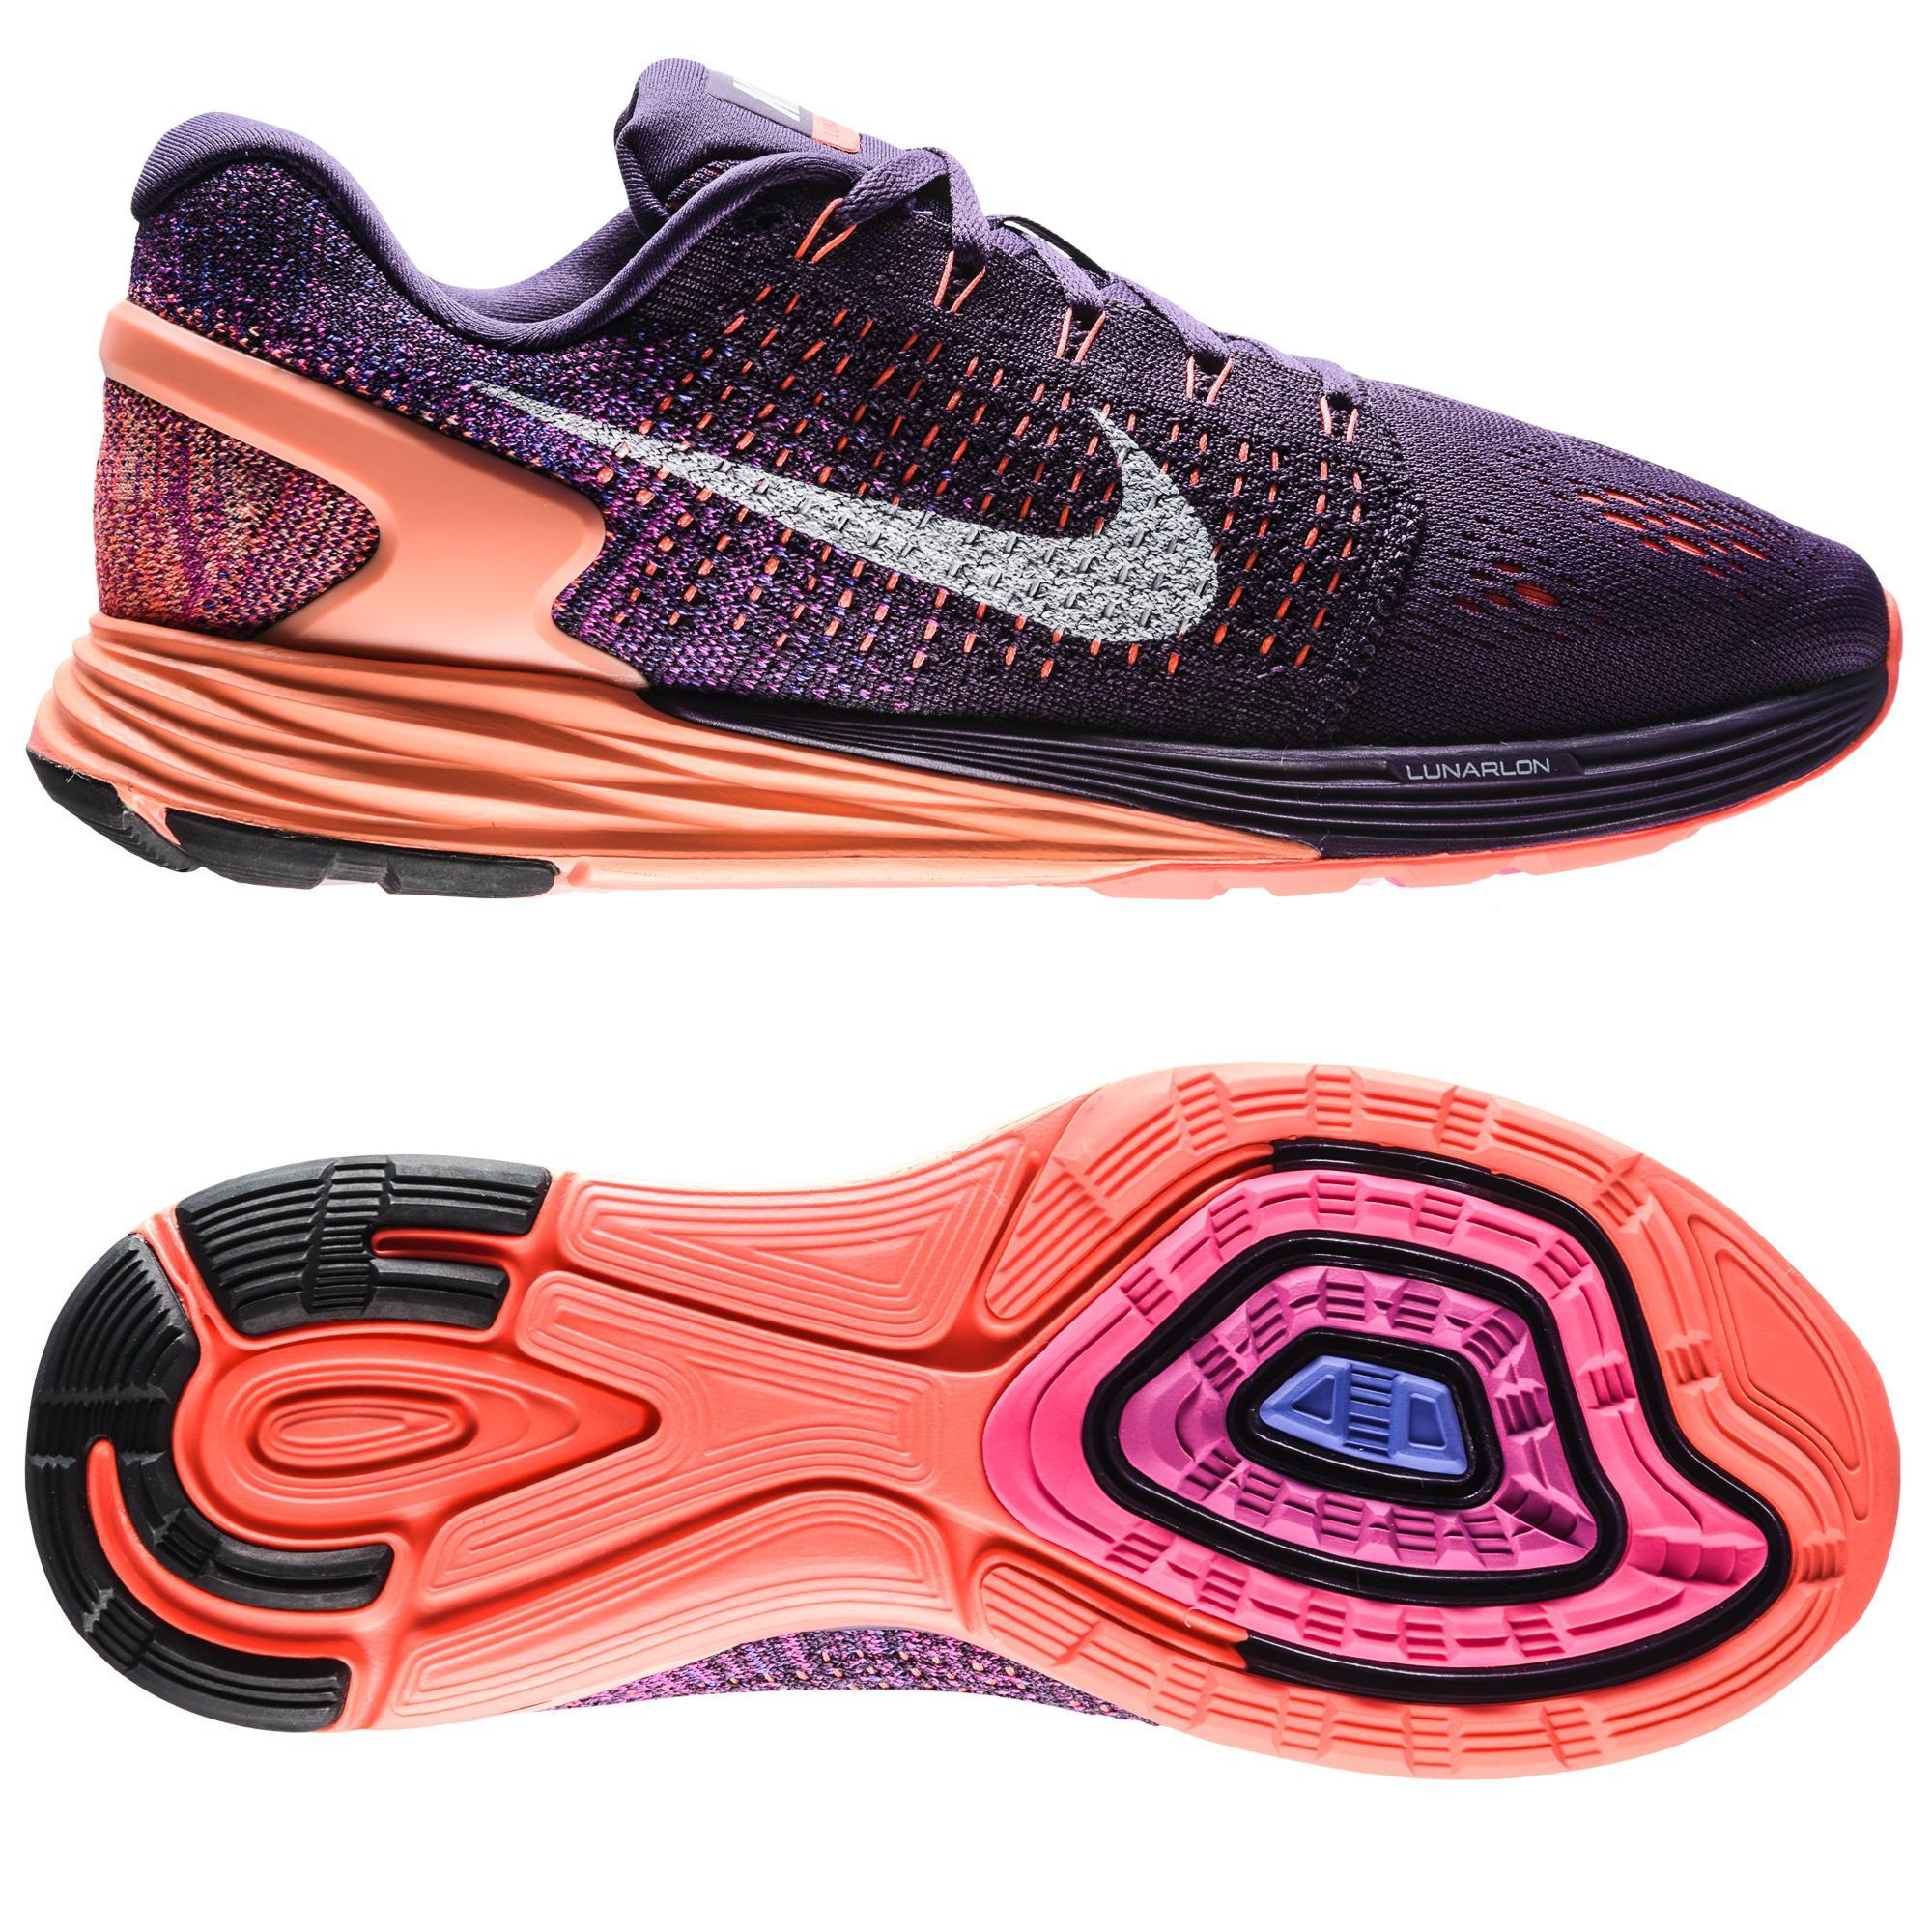 Nike Löparskor Lunarglide 7 Lila/Orange/Vit Dam